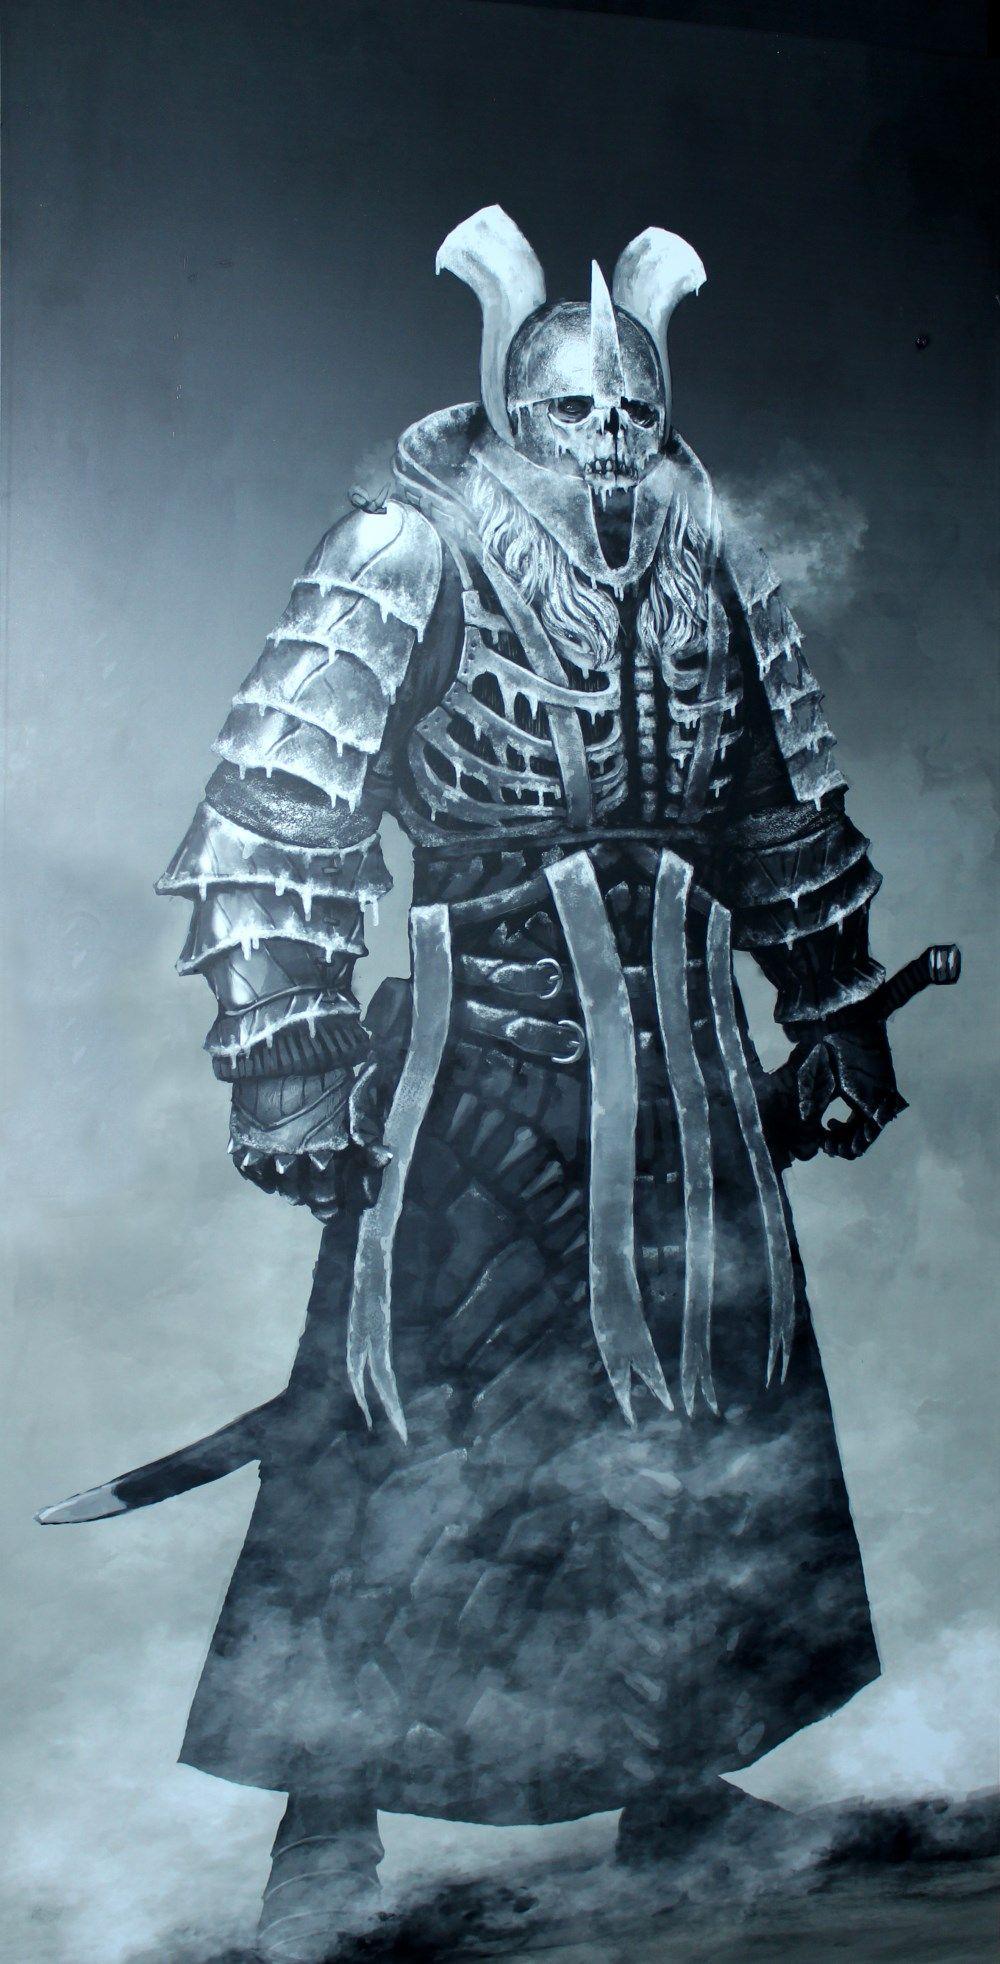 The Witcher 3 Wild Hunt Concept Art Fantasy Character Design Character Art Art The witcher 3 wild hunt art